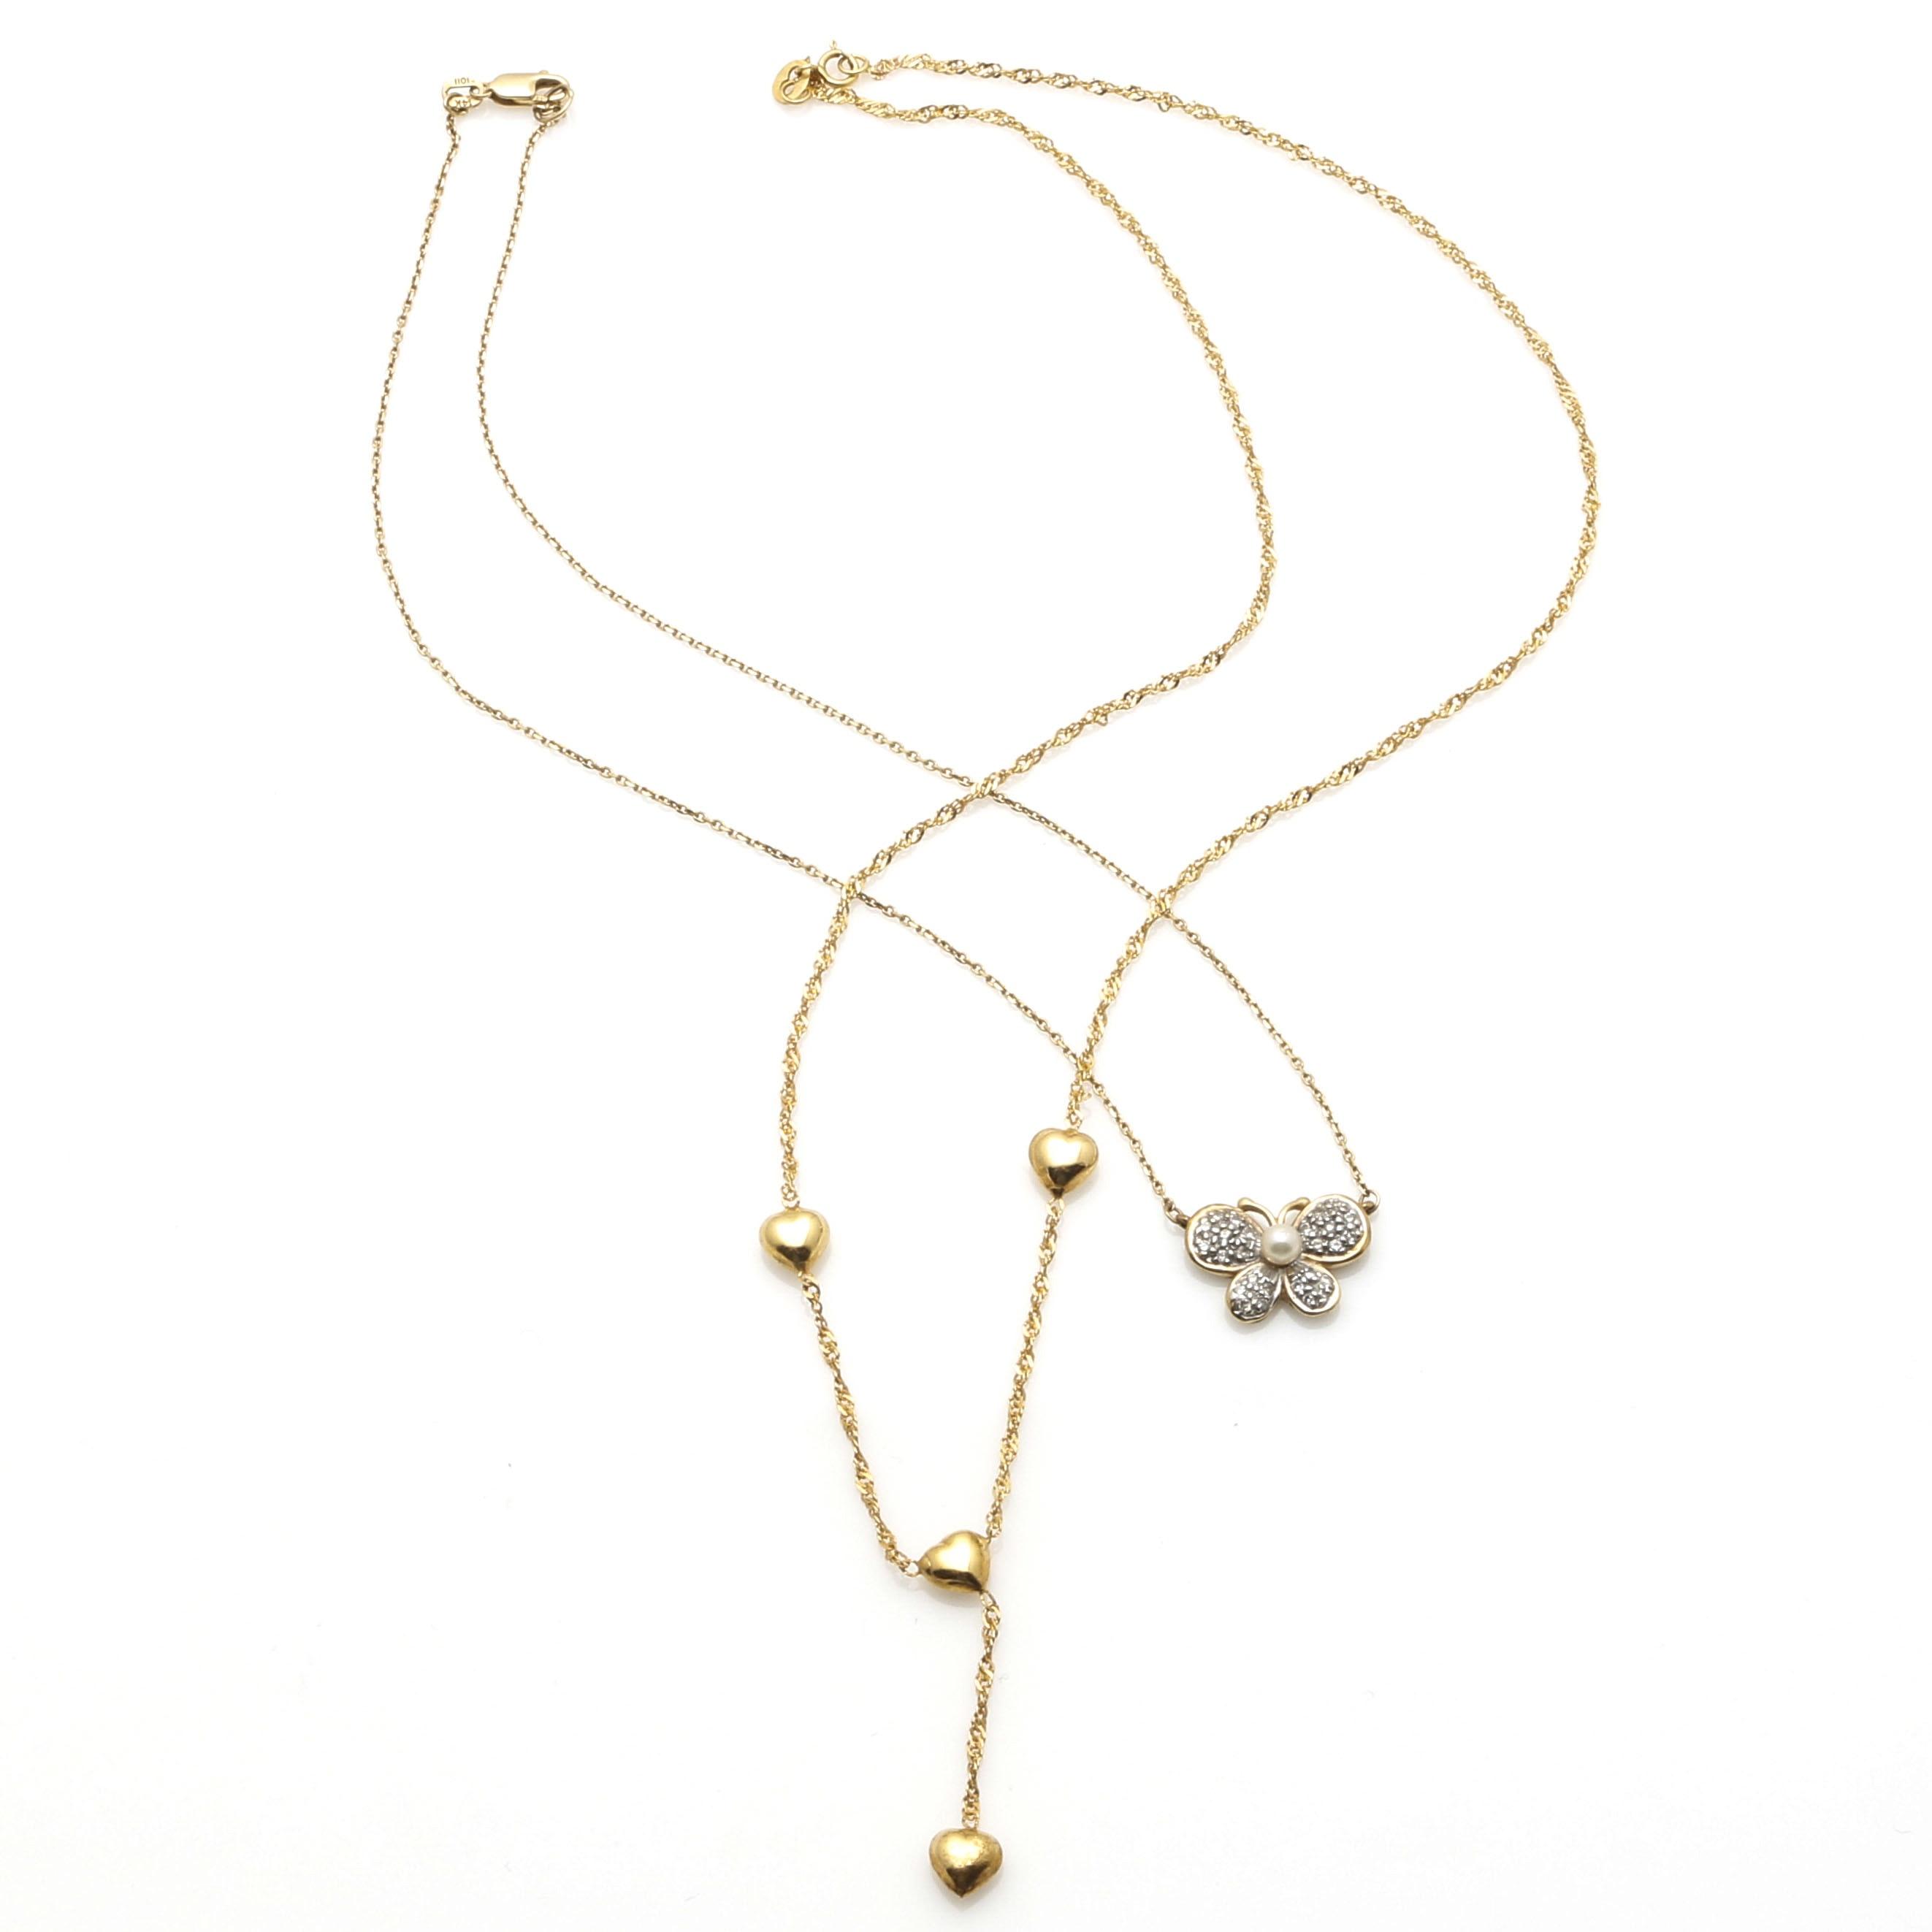 14K Yellow Gold Diamond Necklaces